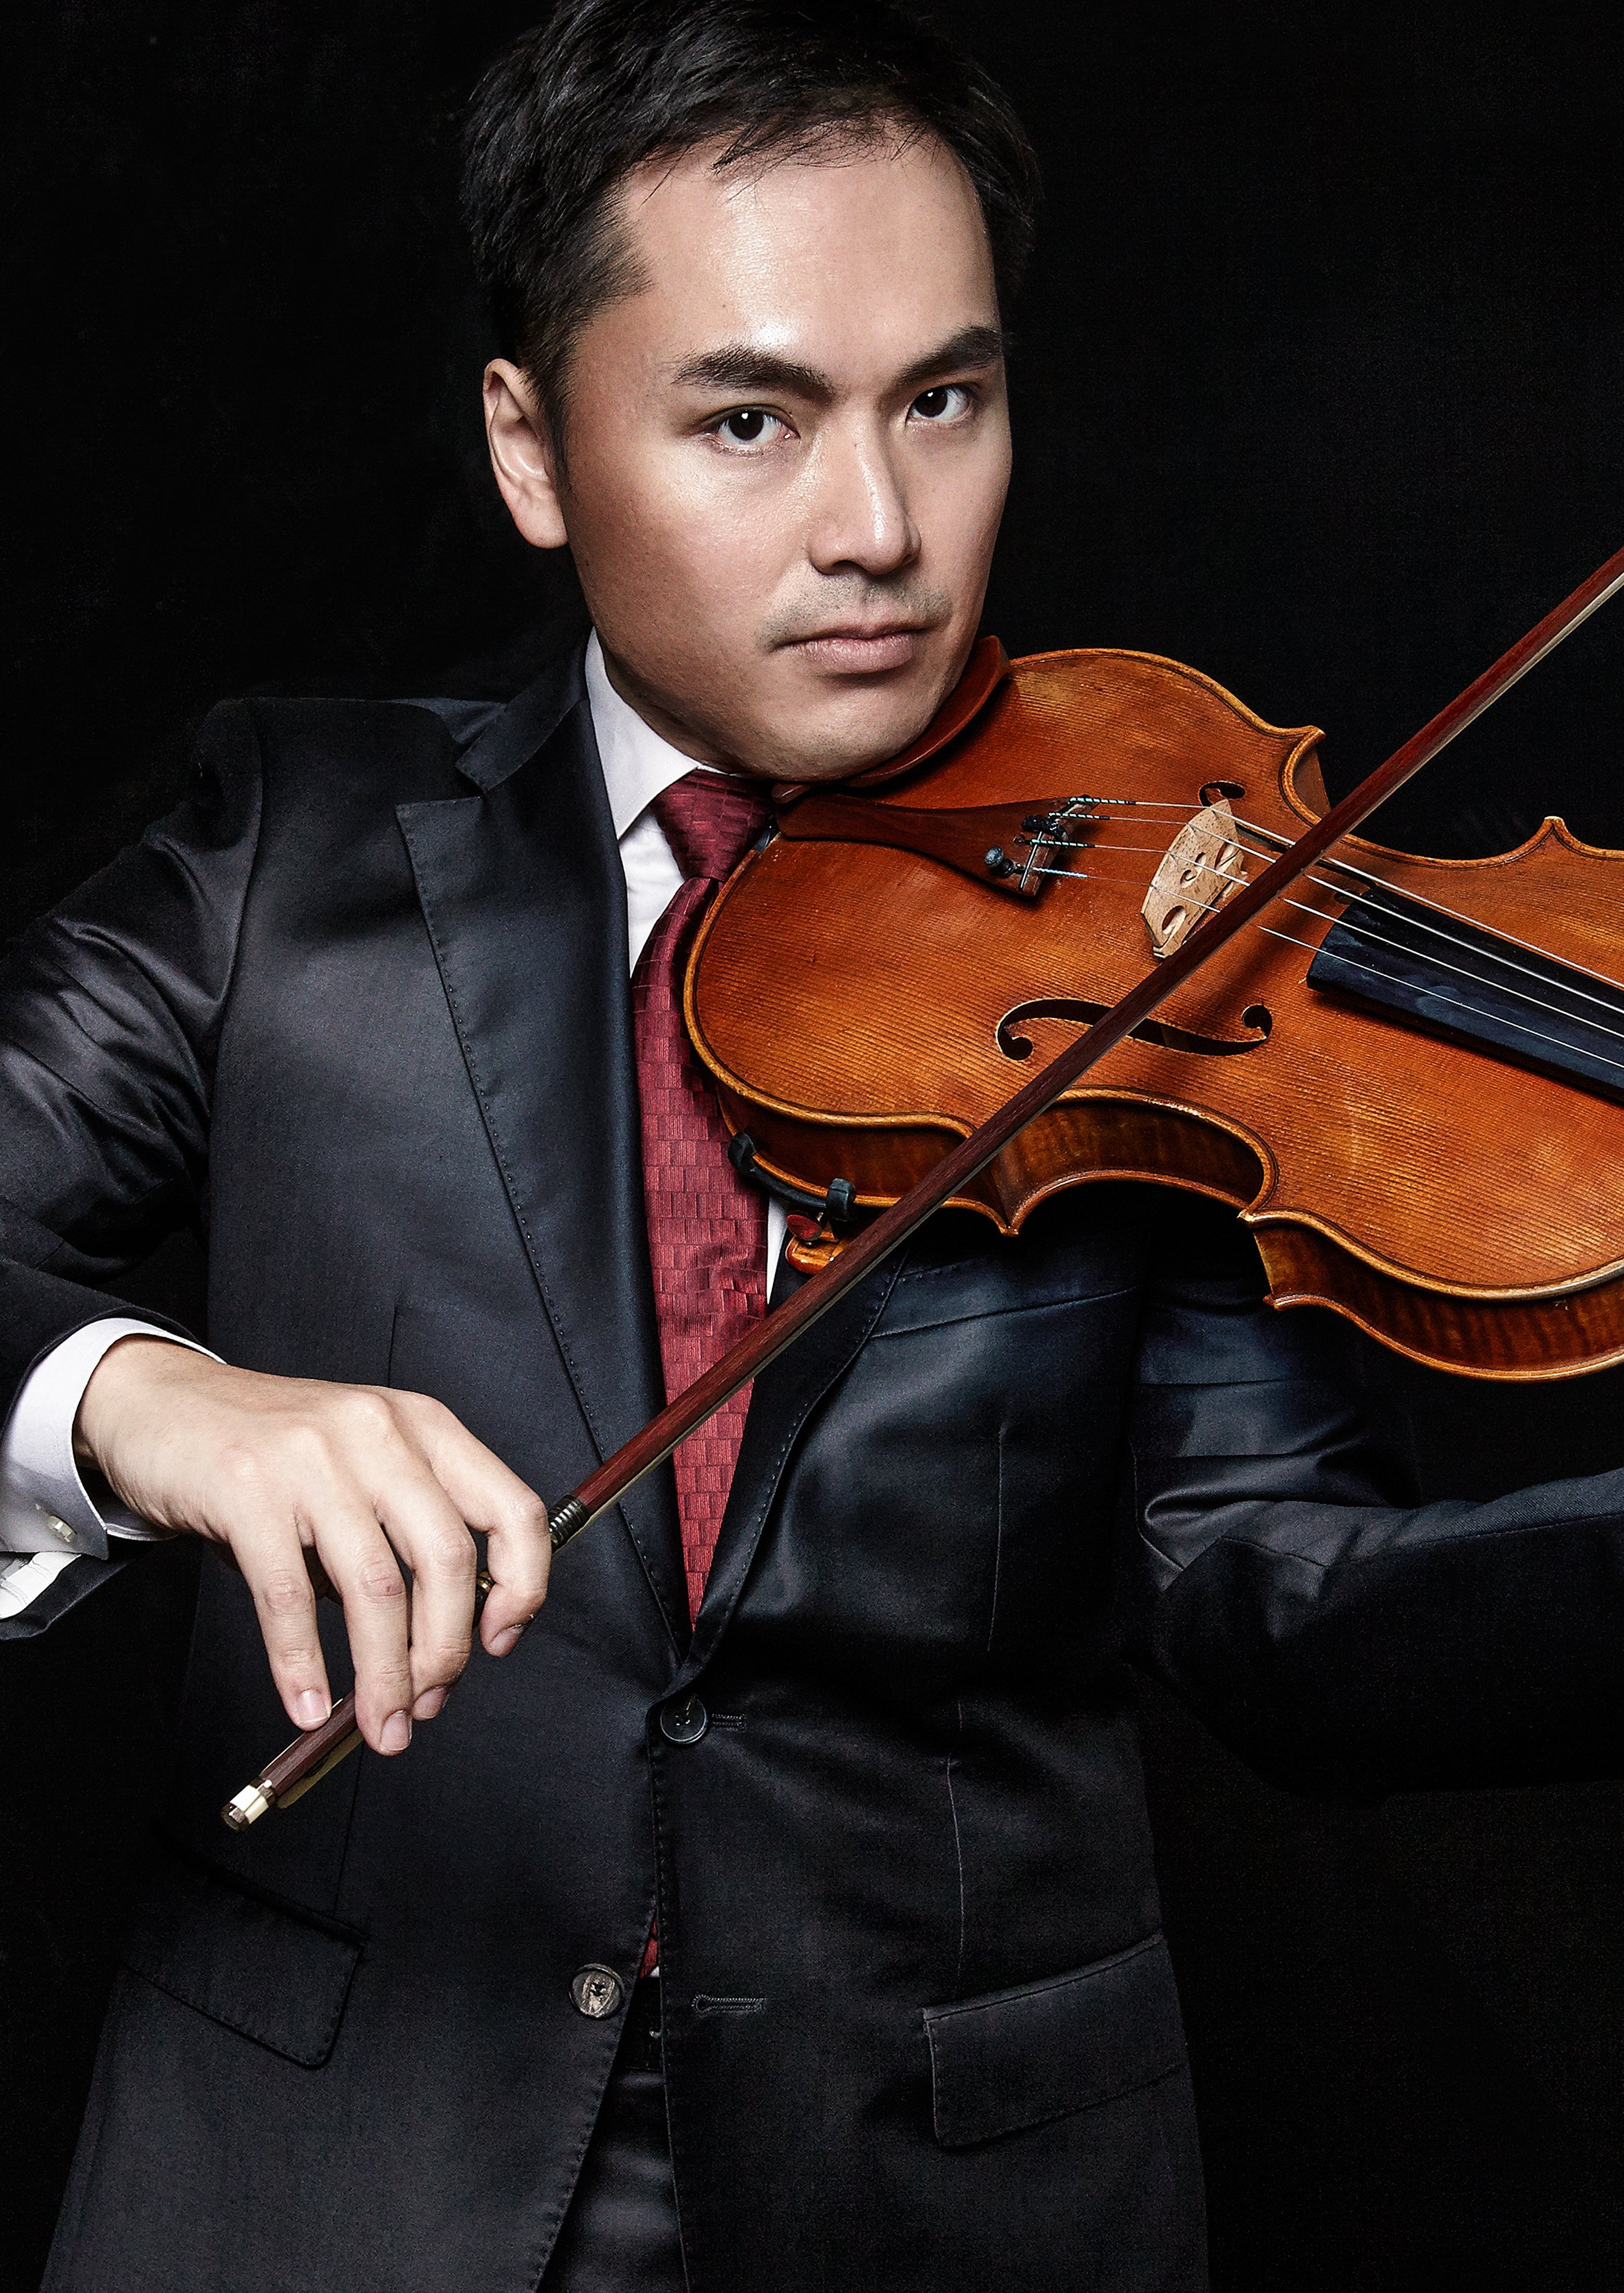 Andy Lin  Member of Amphion String Quartet  中提琴演奏家与博士